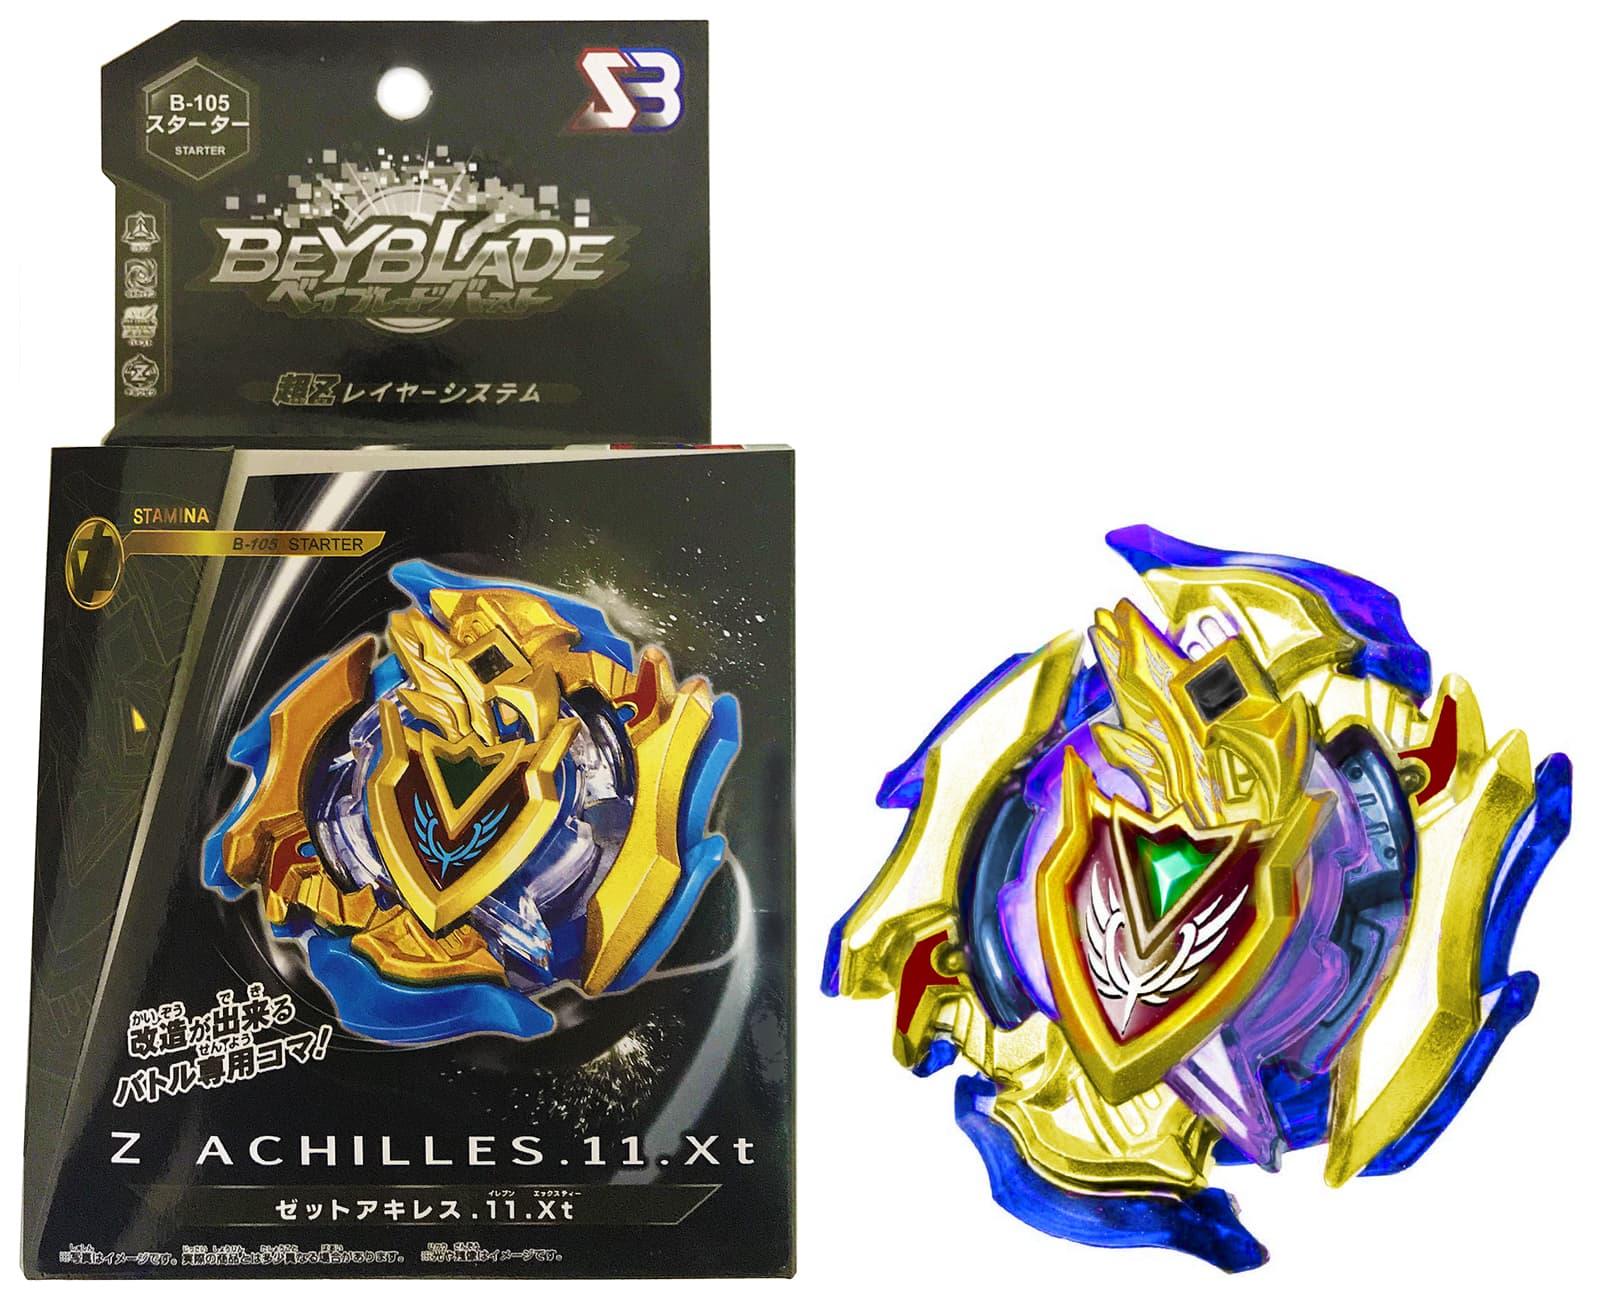 Волчок BEYBLADE  Burst Супер Зет Голд Ахиллес (Z Achilles 11.Xt Super Z Gold) B-105 от SB с Запускателем